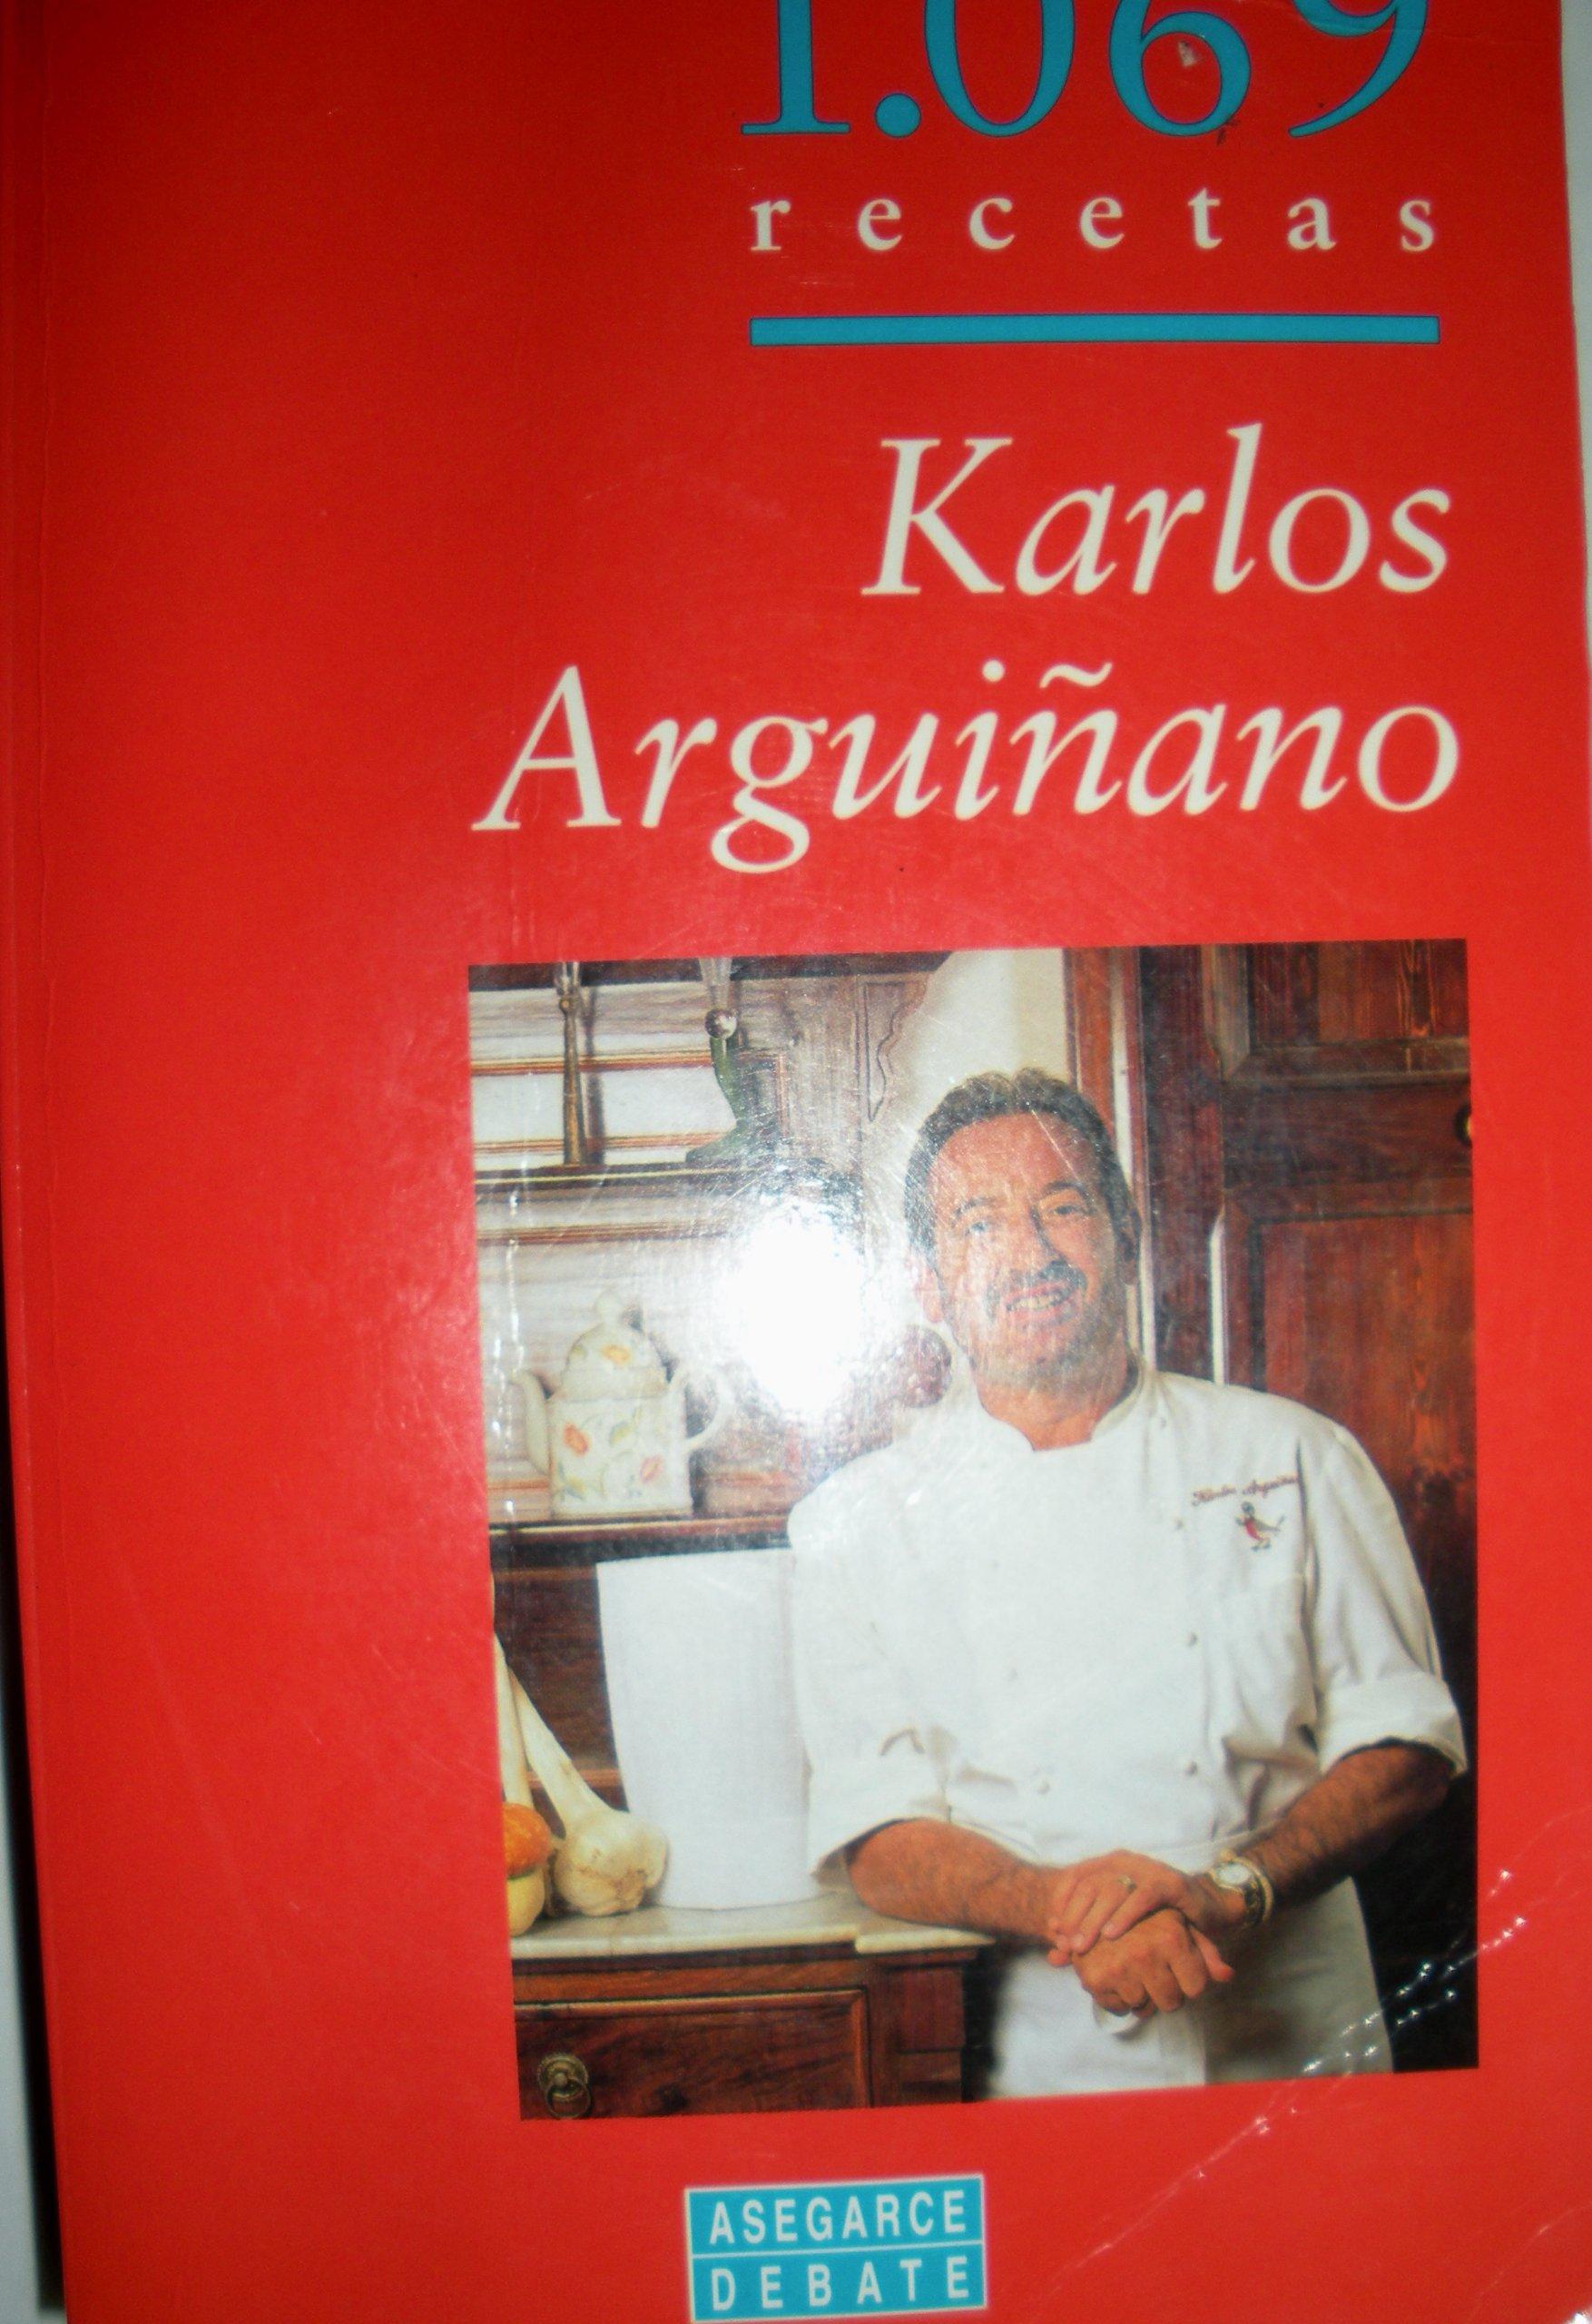 1.069 Recetas (Spanish Edition): Karlos Arguinano: 9788483060377:  Amazon.com: Books